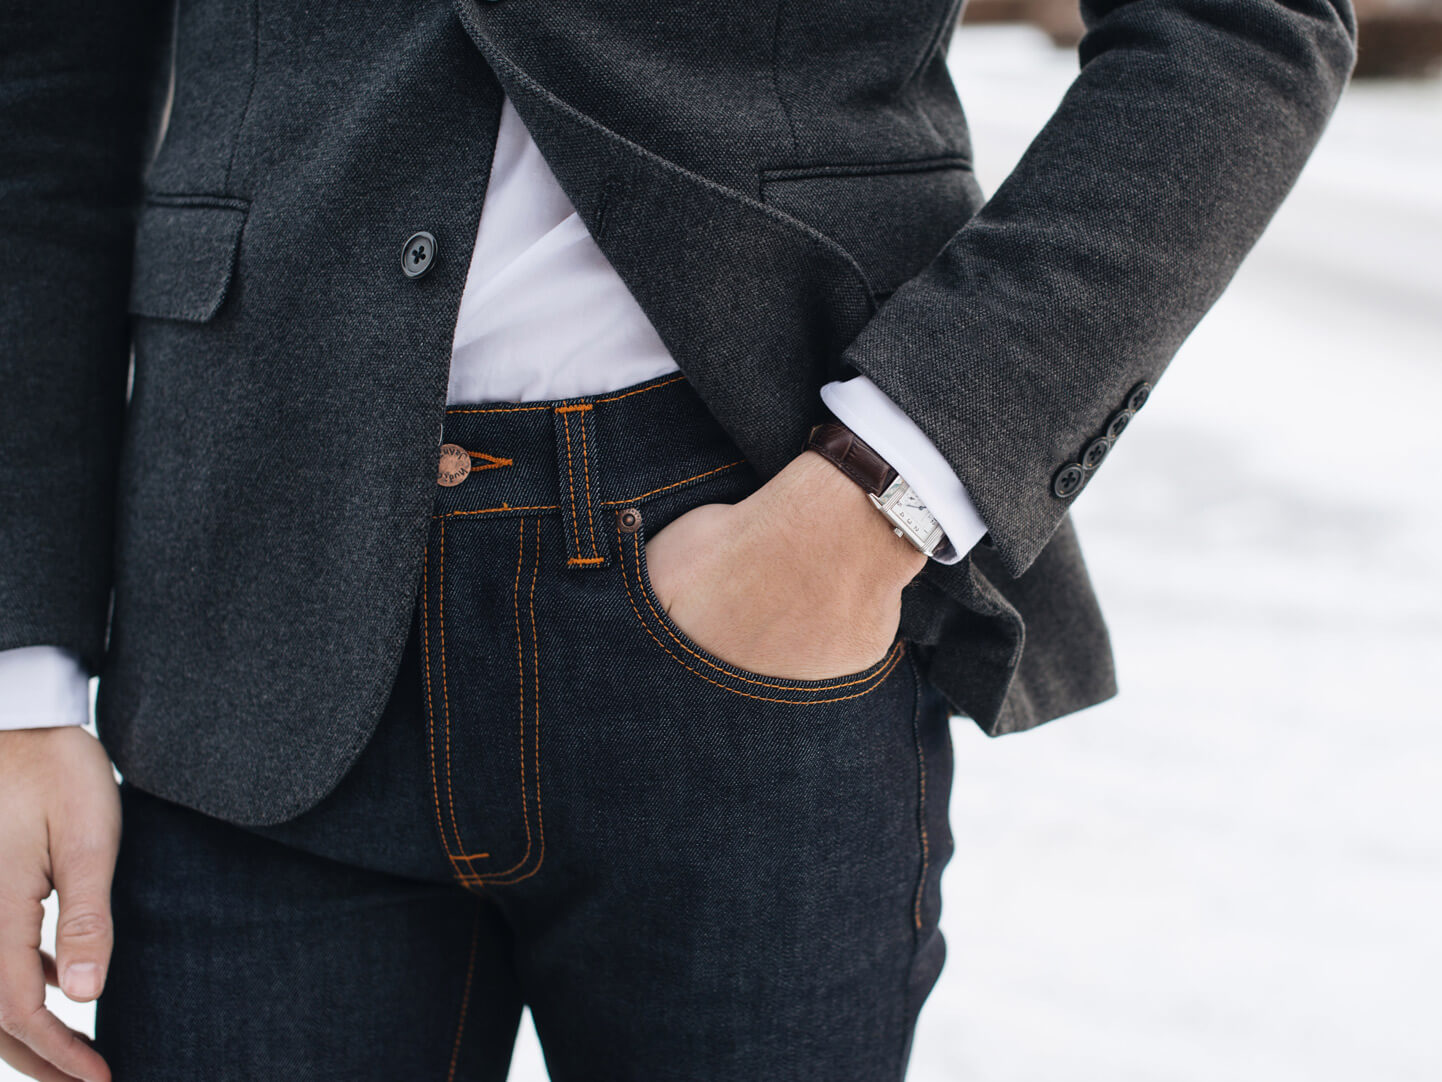 f8631dc9b4d Att bära jeans till kavaj | CareOfCarl.com